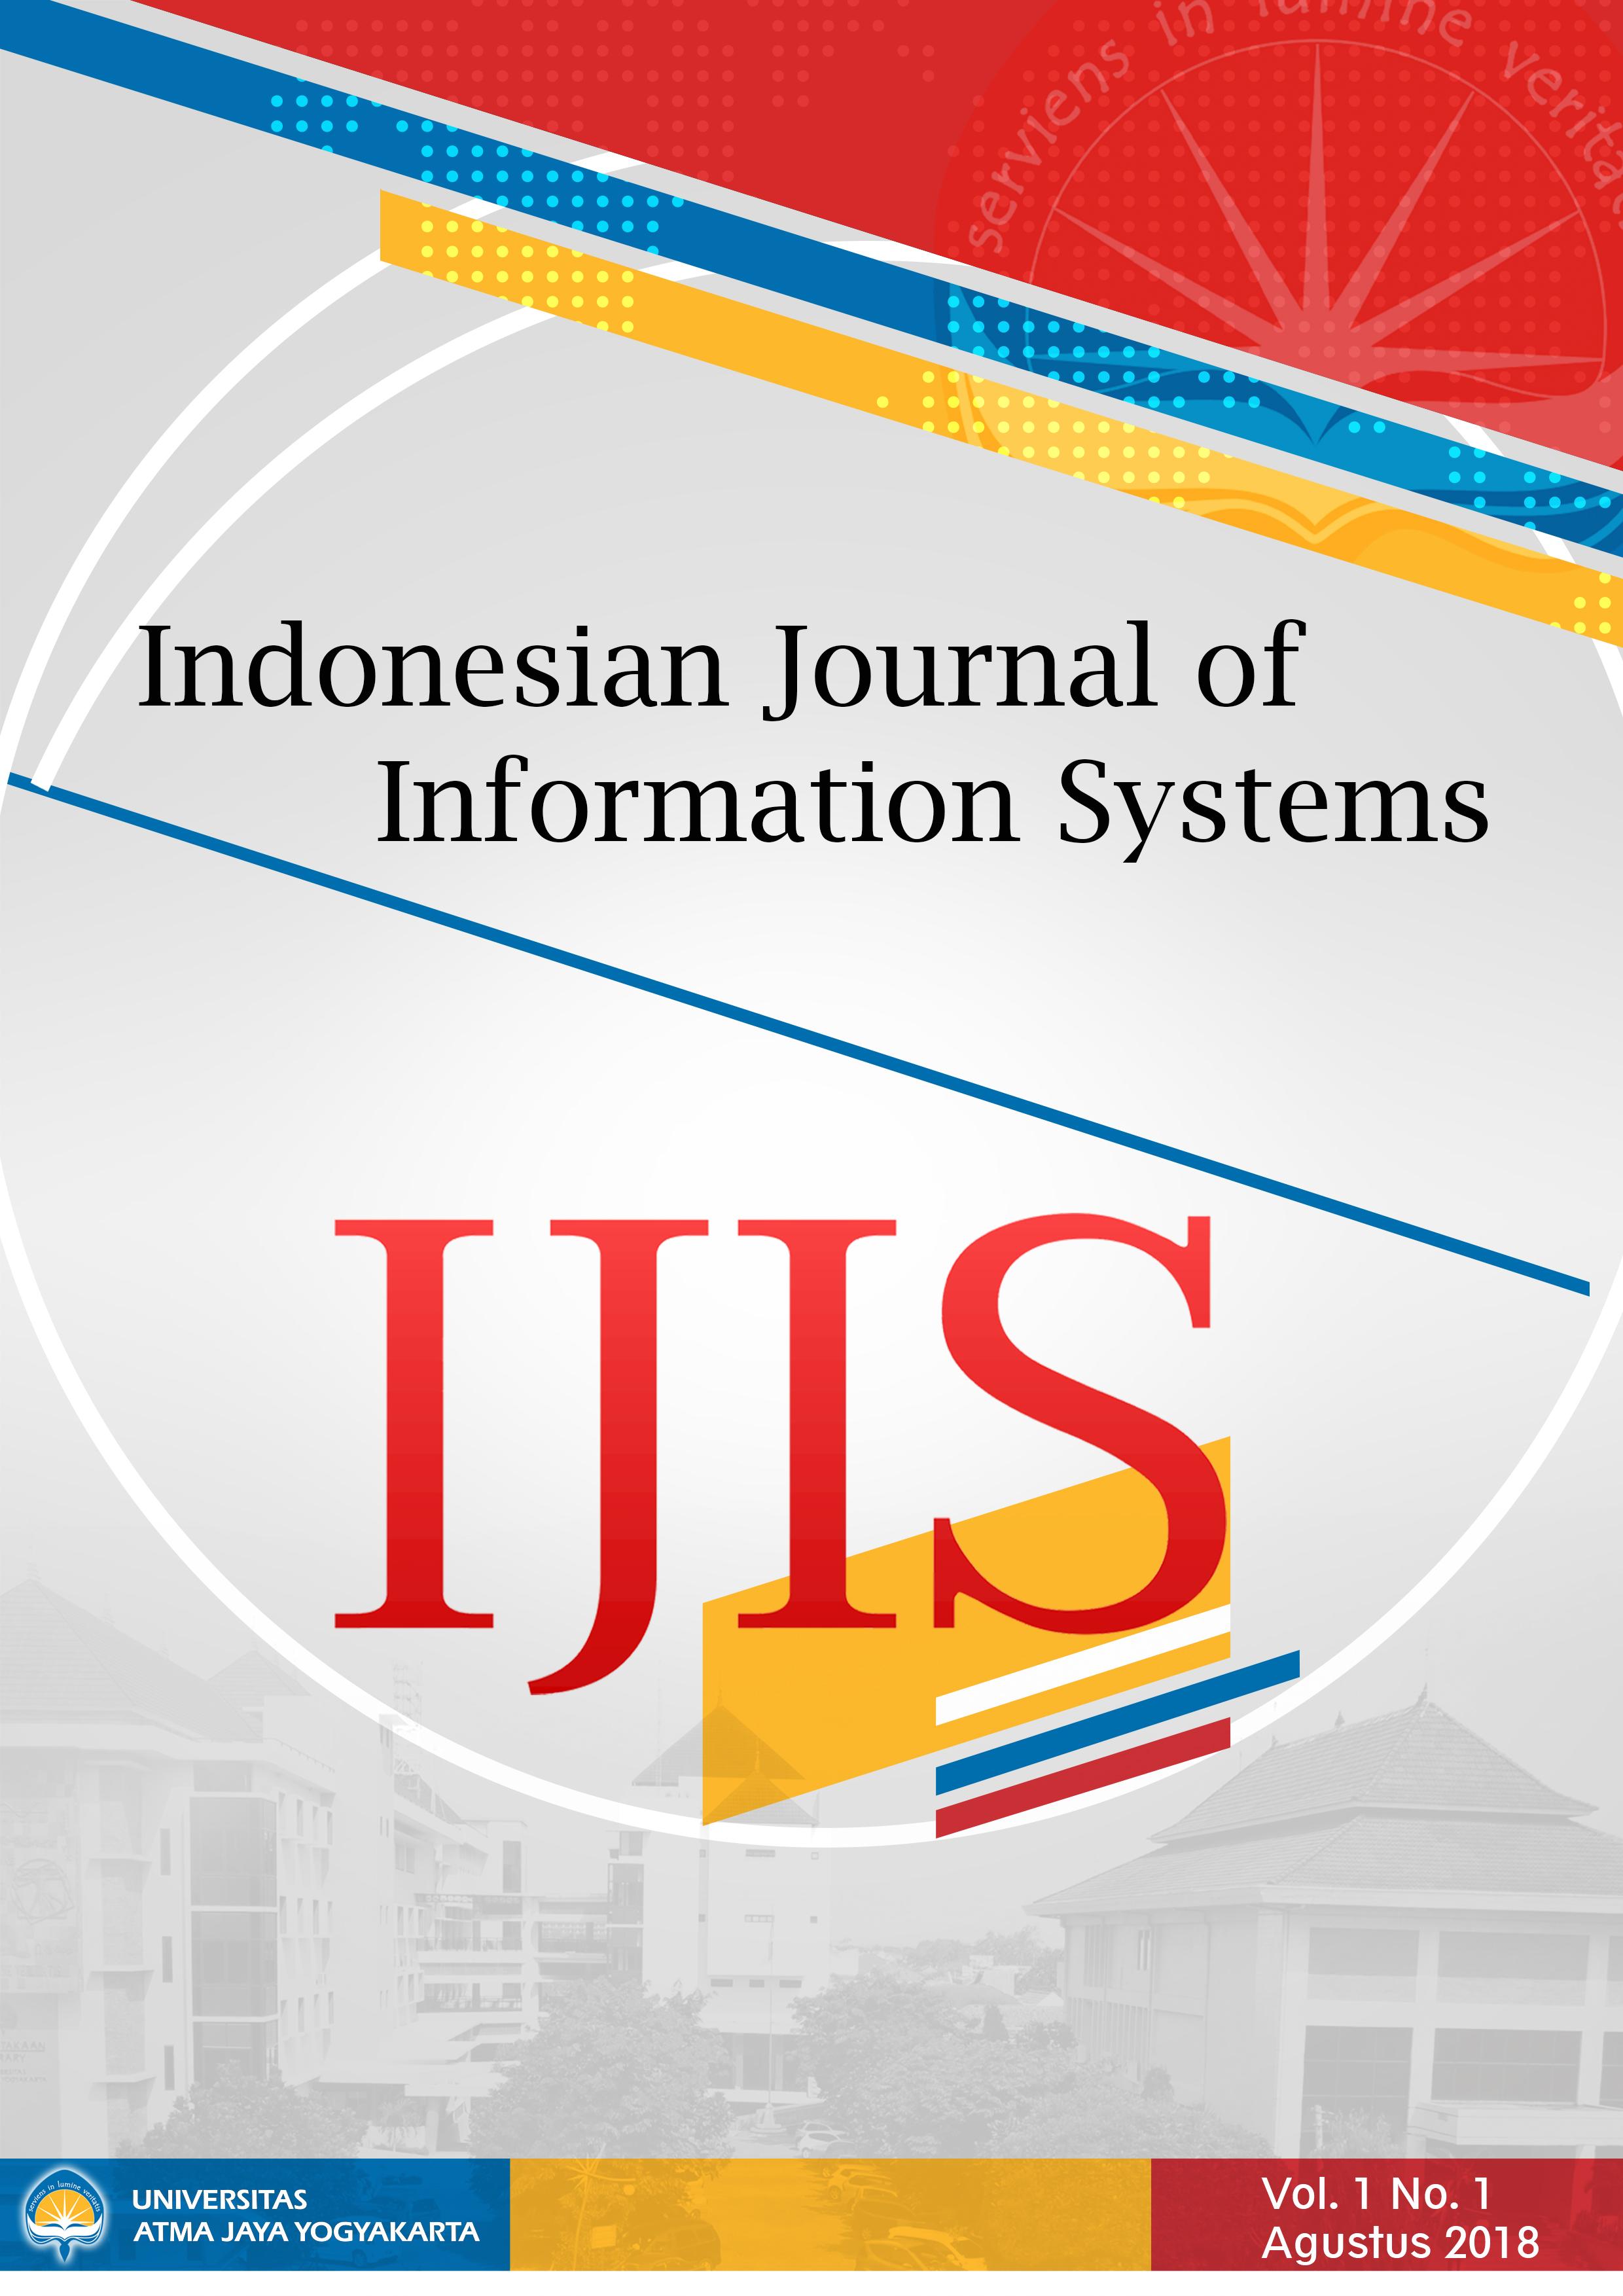 IJIS Vol. 1, No. 1, Agustus 2018